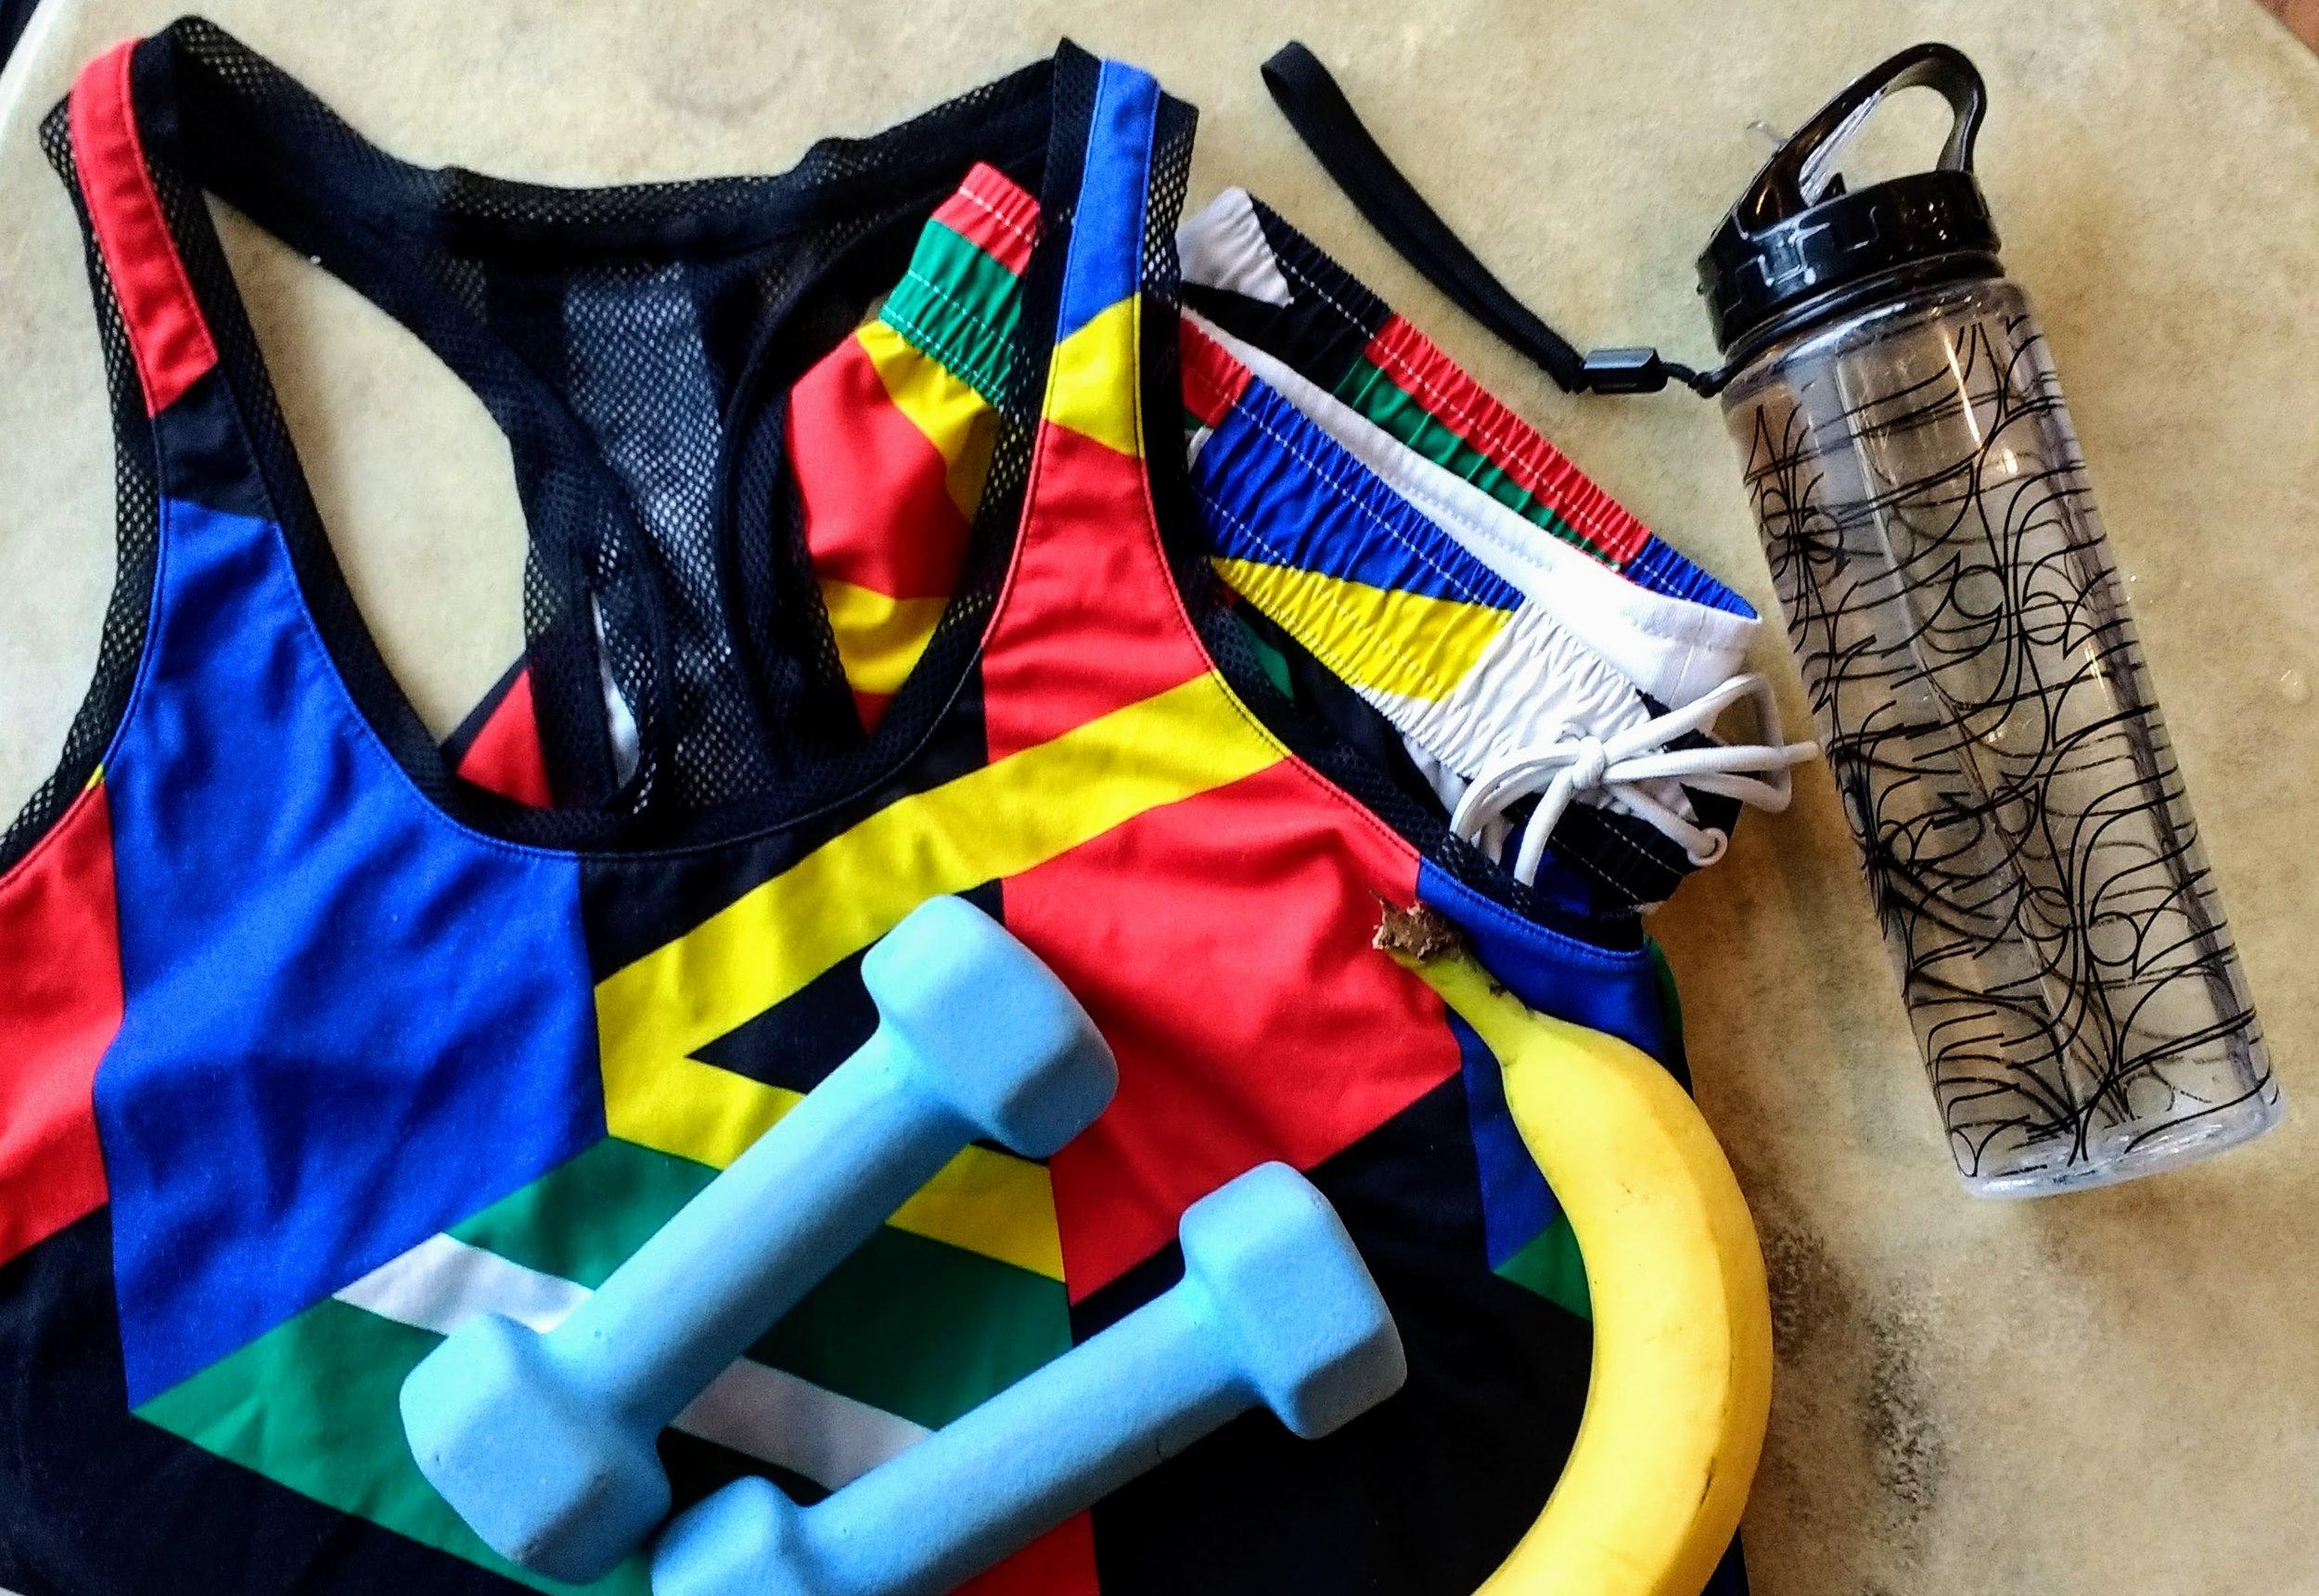 Beneath the Crust: My fitness motivation